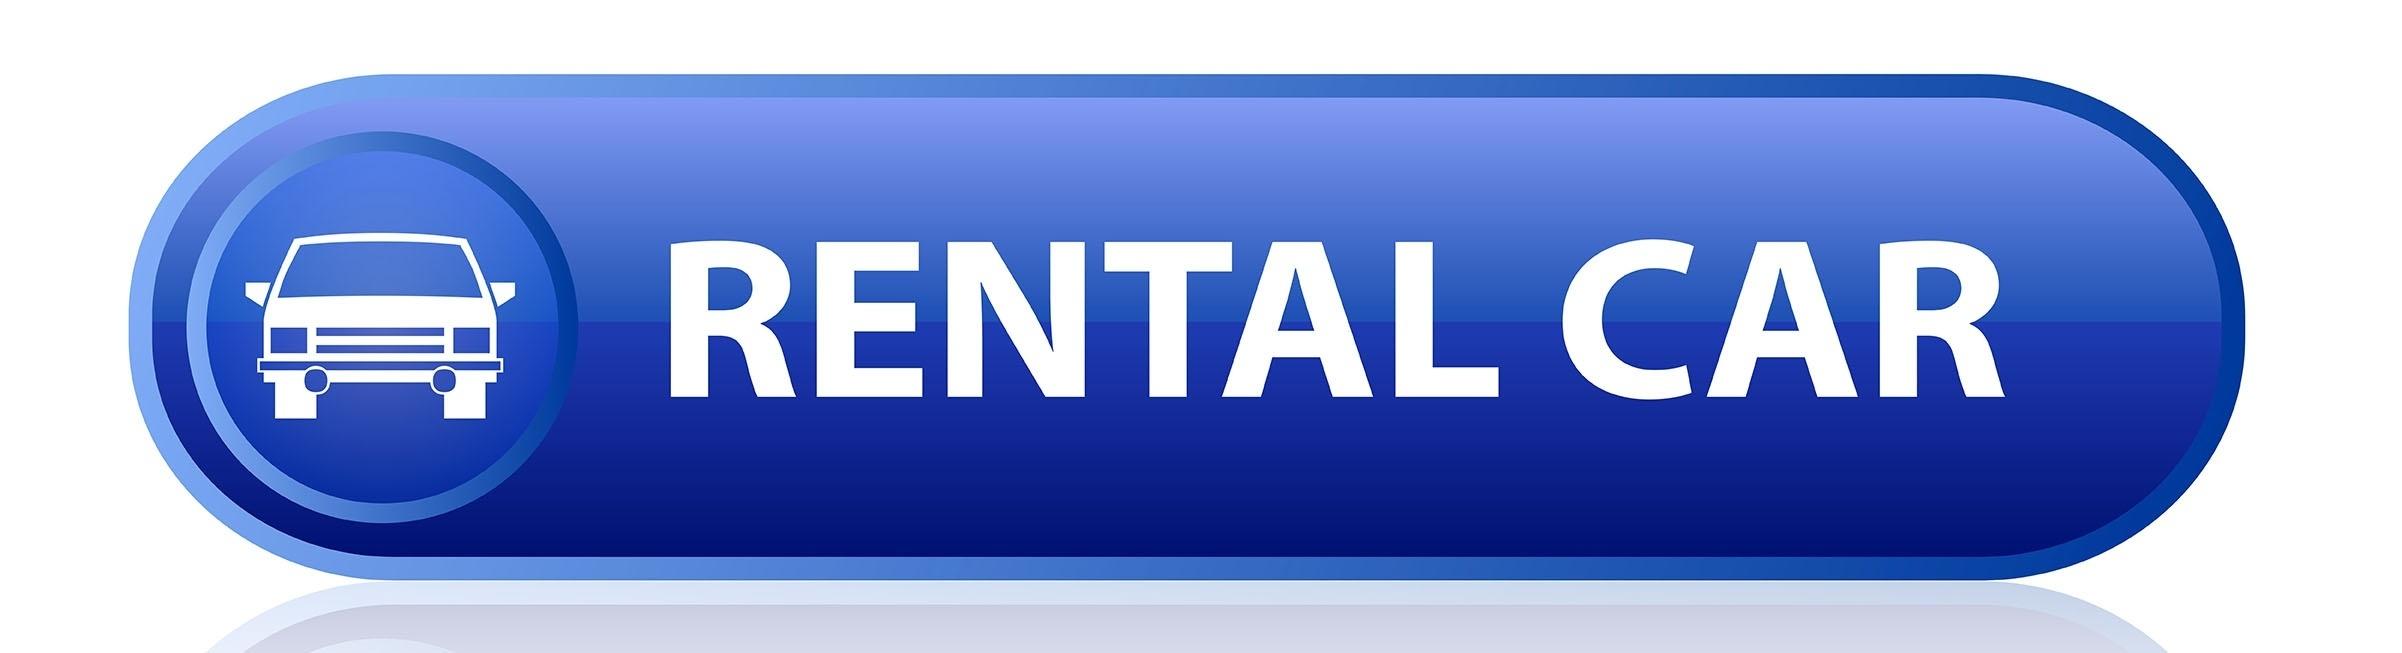 Car Rental Insurance